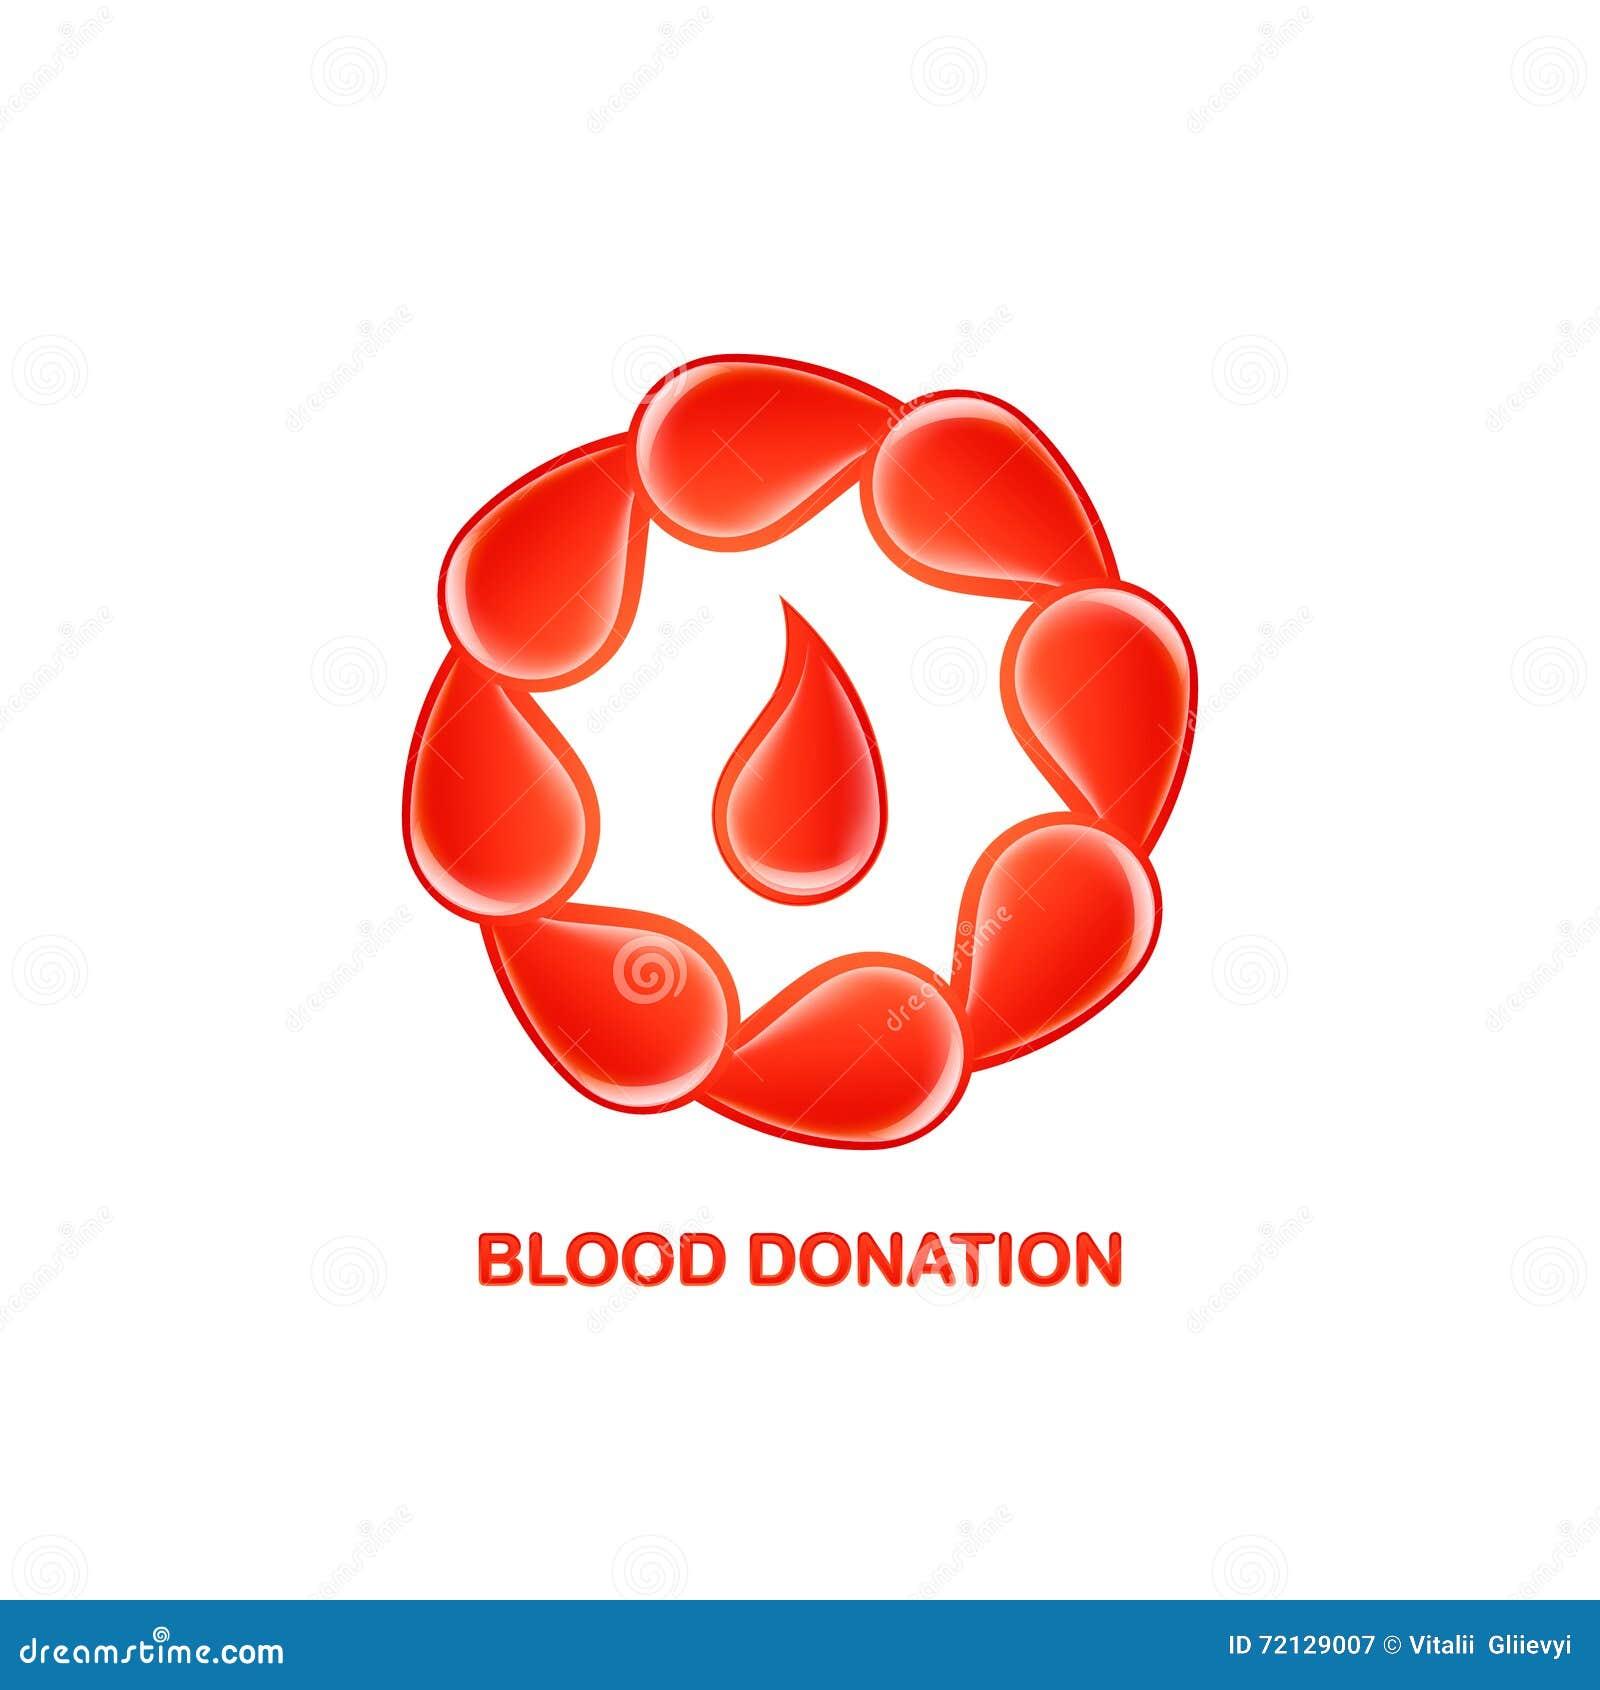 Blood donation logo stock vector illustration of health 72129007 blood donation logo buycottarizona